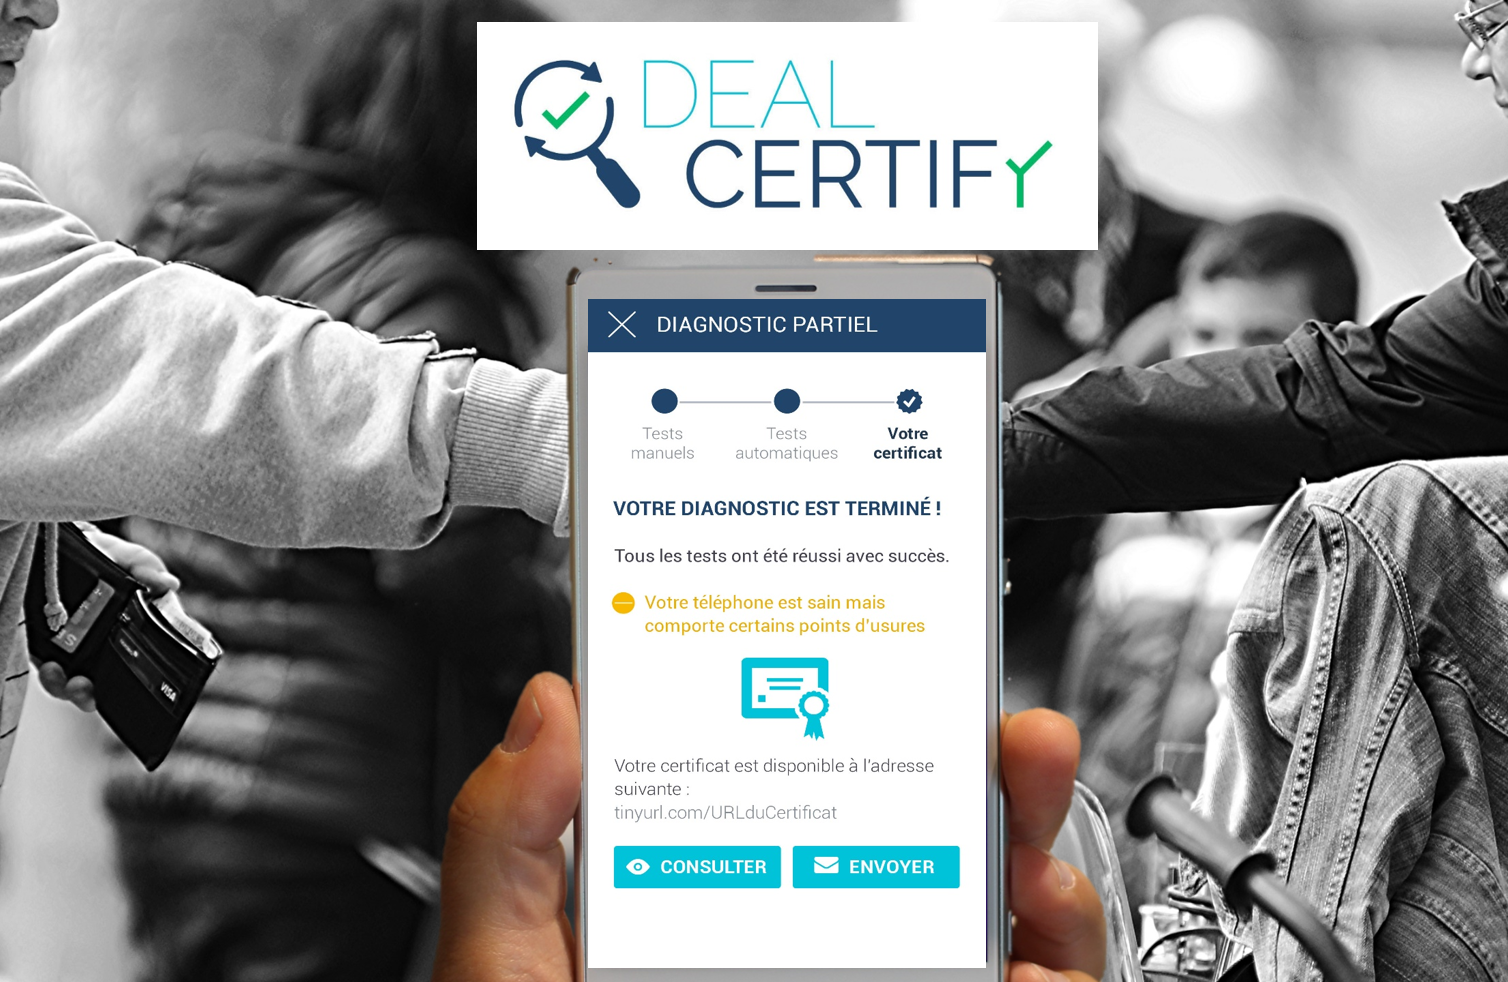 deal certify